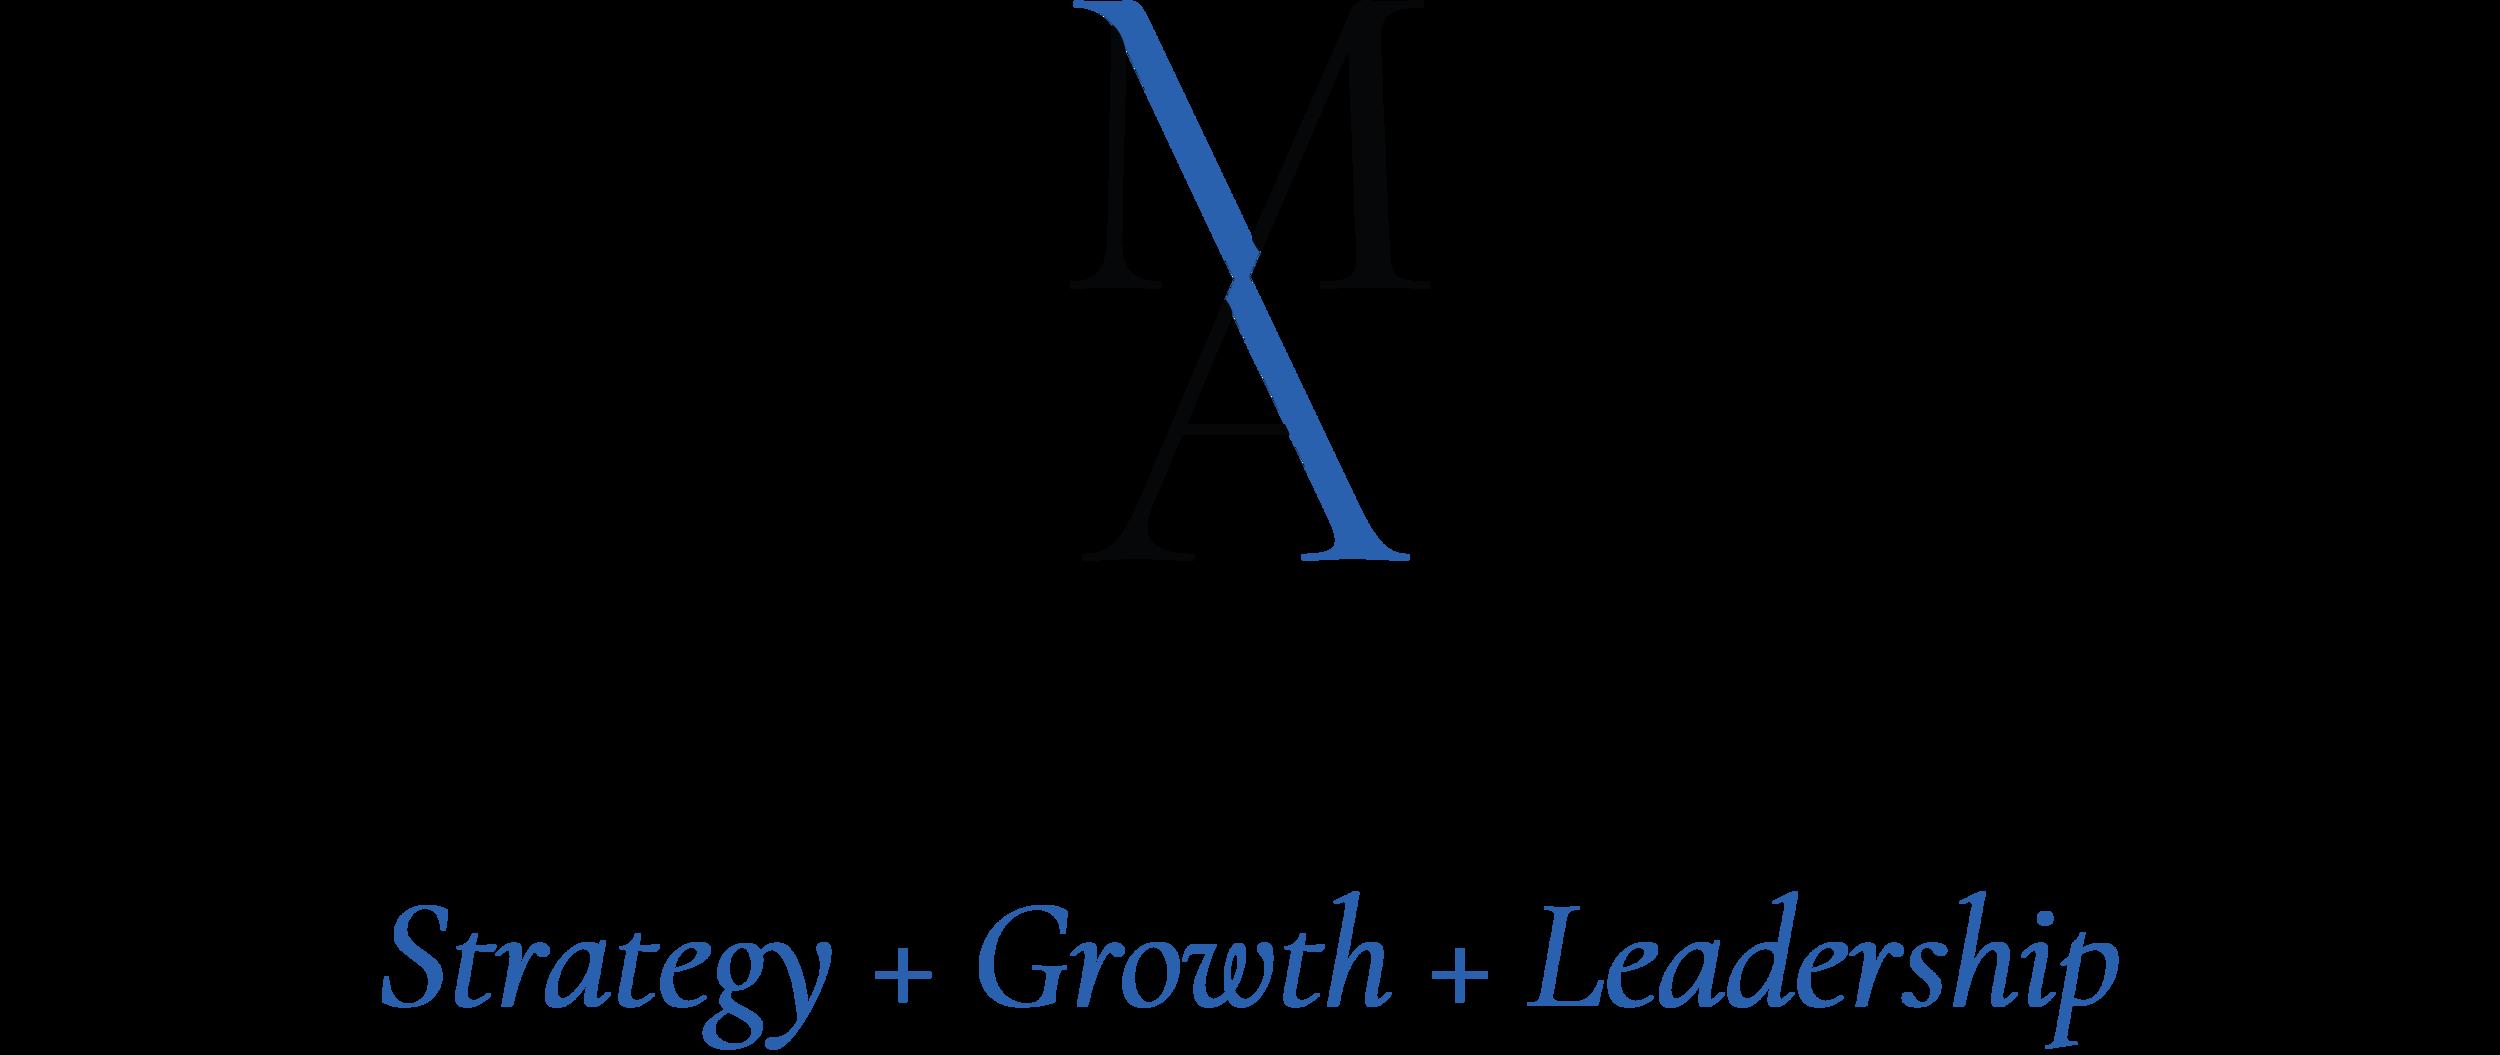 logo-final-tagline.png